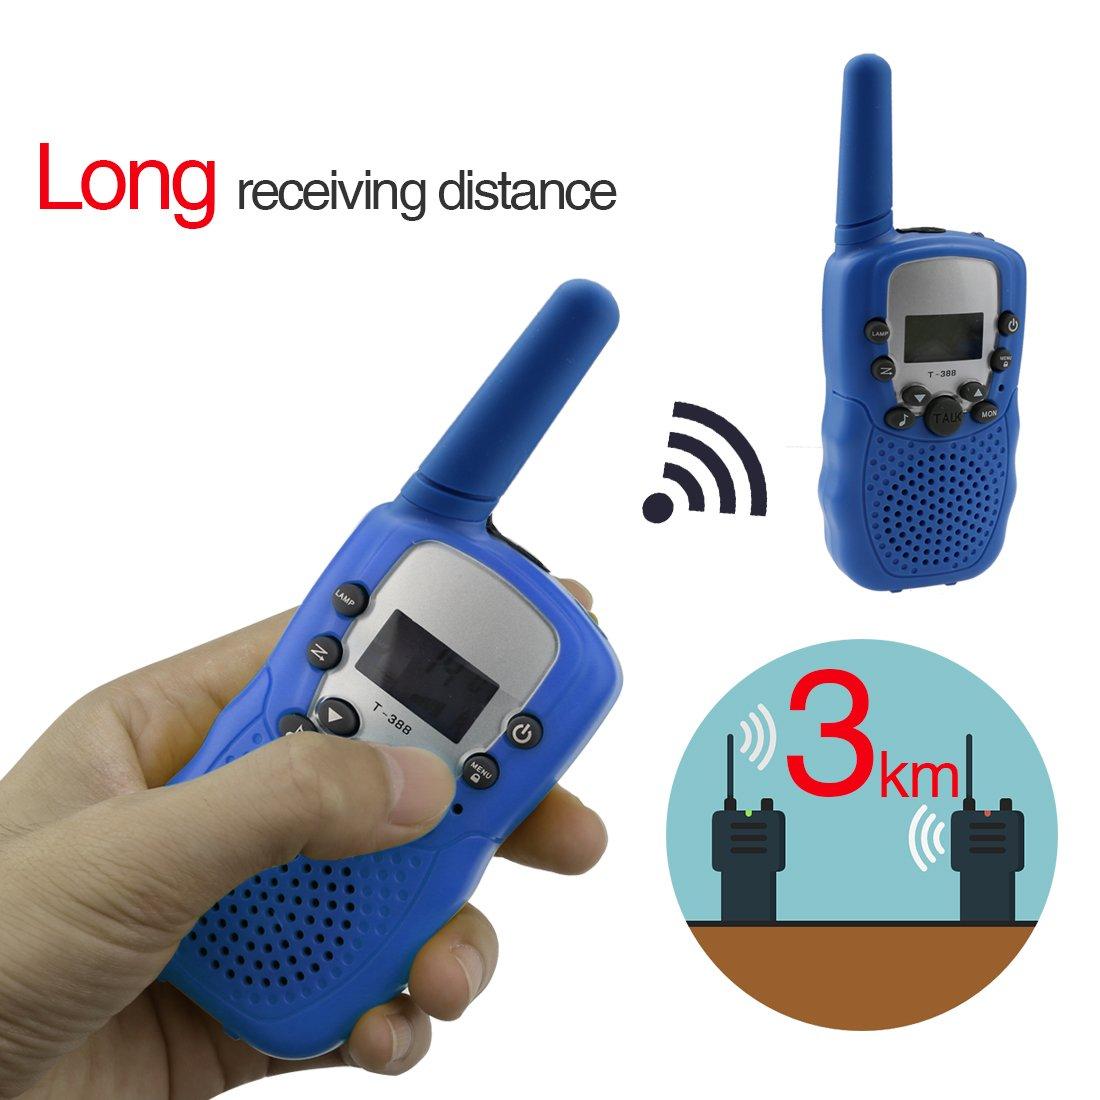 a-szcxtop 2 Pieceトランシーバーのラジオの子供用大人用 – 22チャンネル/Takeについては長い距離インターホンforアウトドアキャンプ旅行 B073STJF94 Deepy Blue Deepy Blue